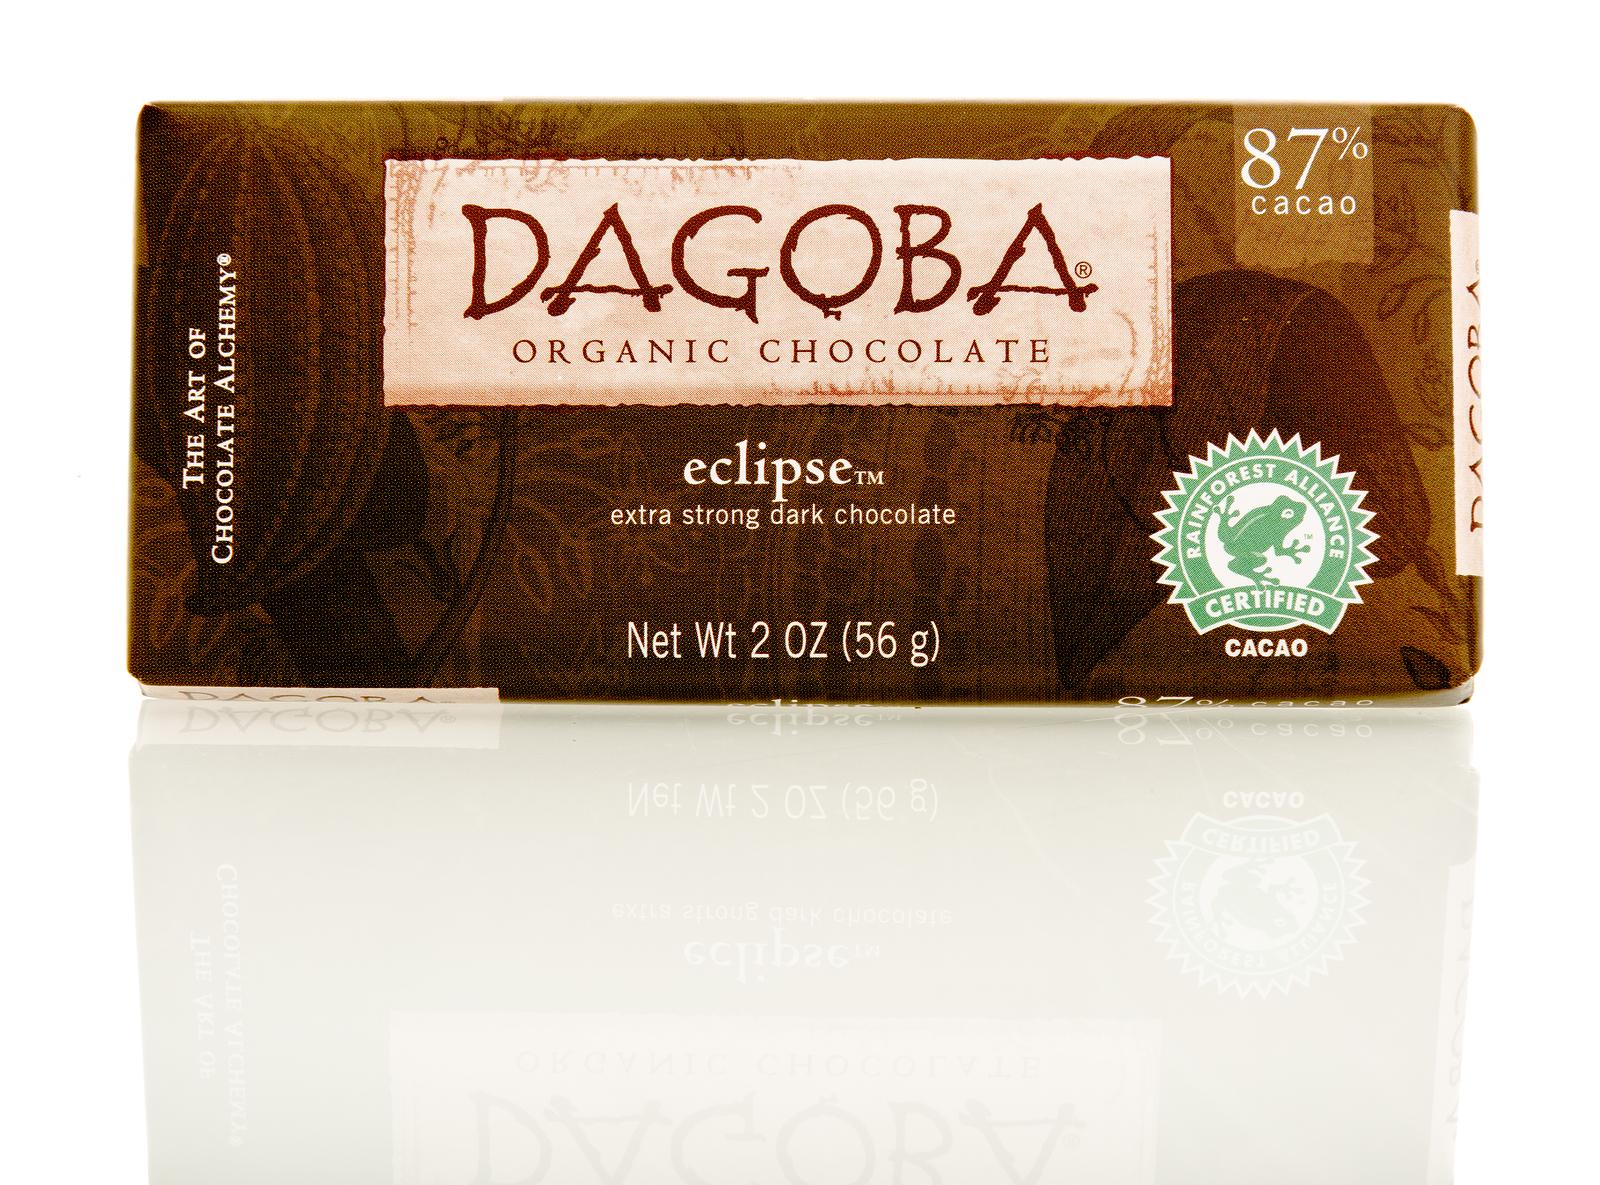 Dagoba Eclipse 87% Extra Strong Dark Chocolate Bar in Wrapper.